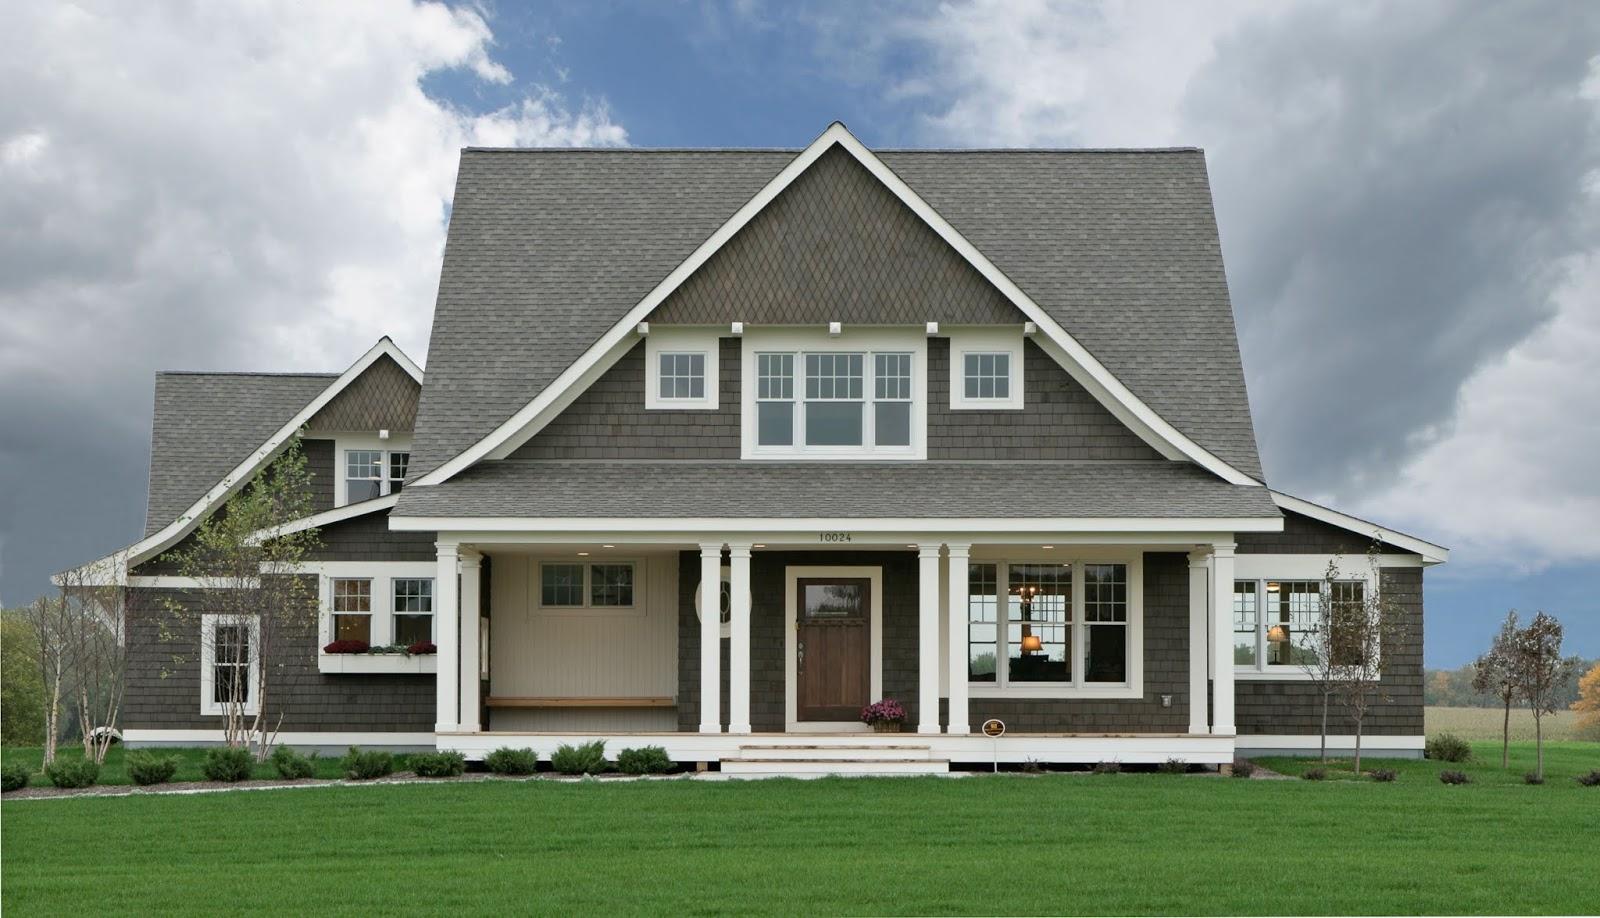 Simply Elegant Home Designs Blog on tropical home design plans, traditional home design plans, futuristic home design plans, efficient home design plans, best small house design plans,